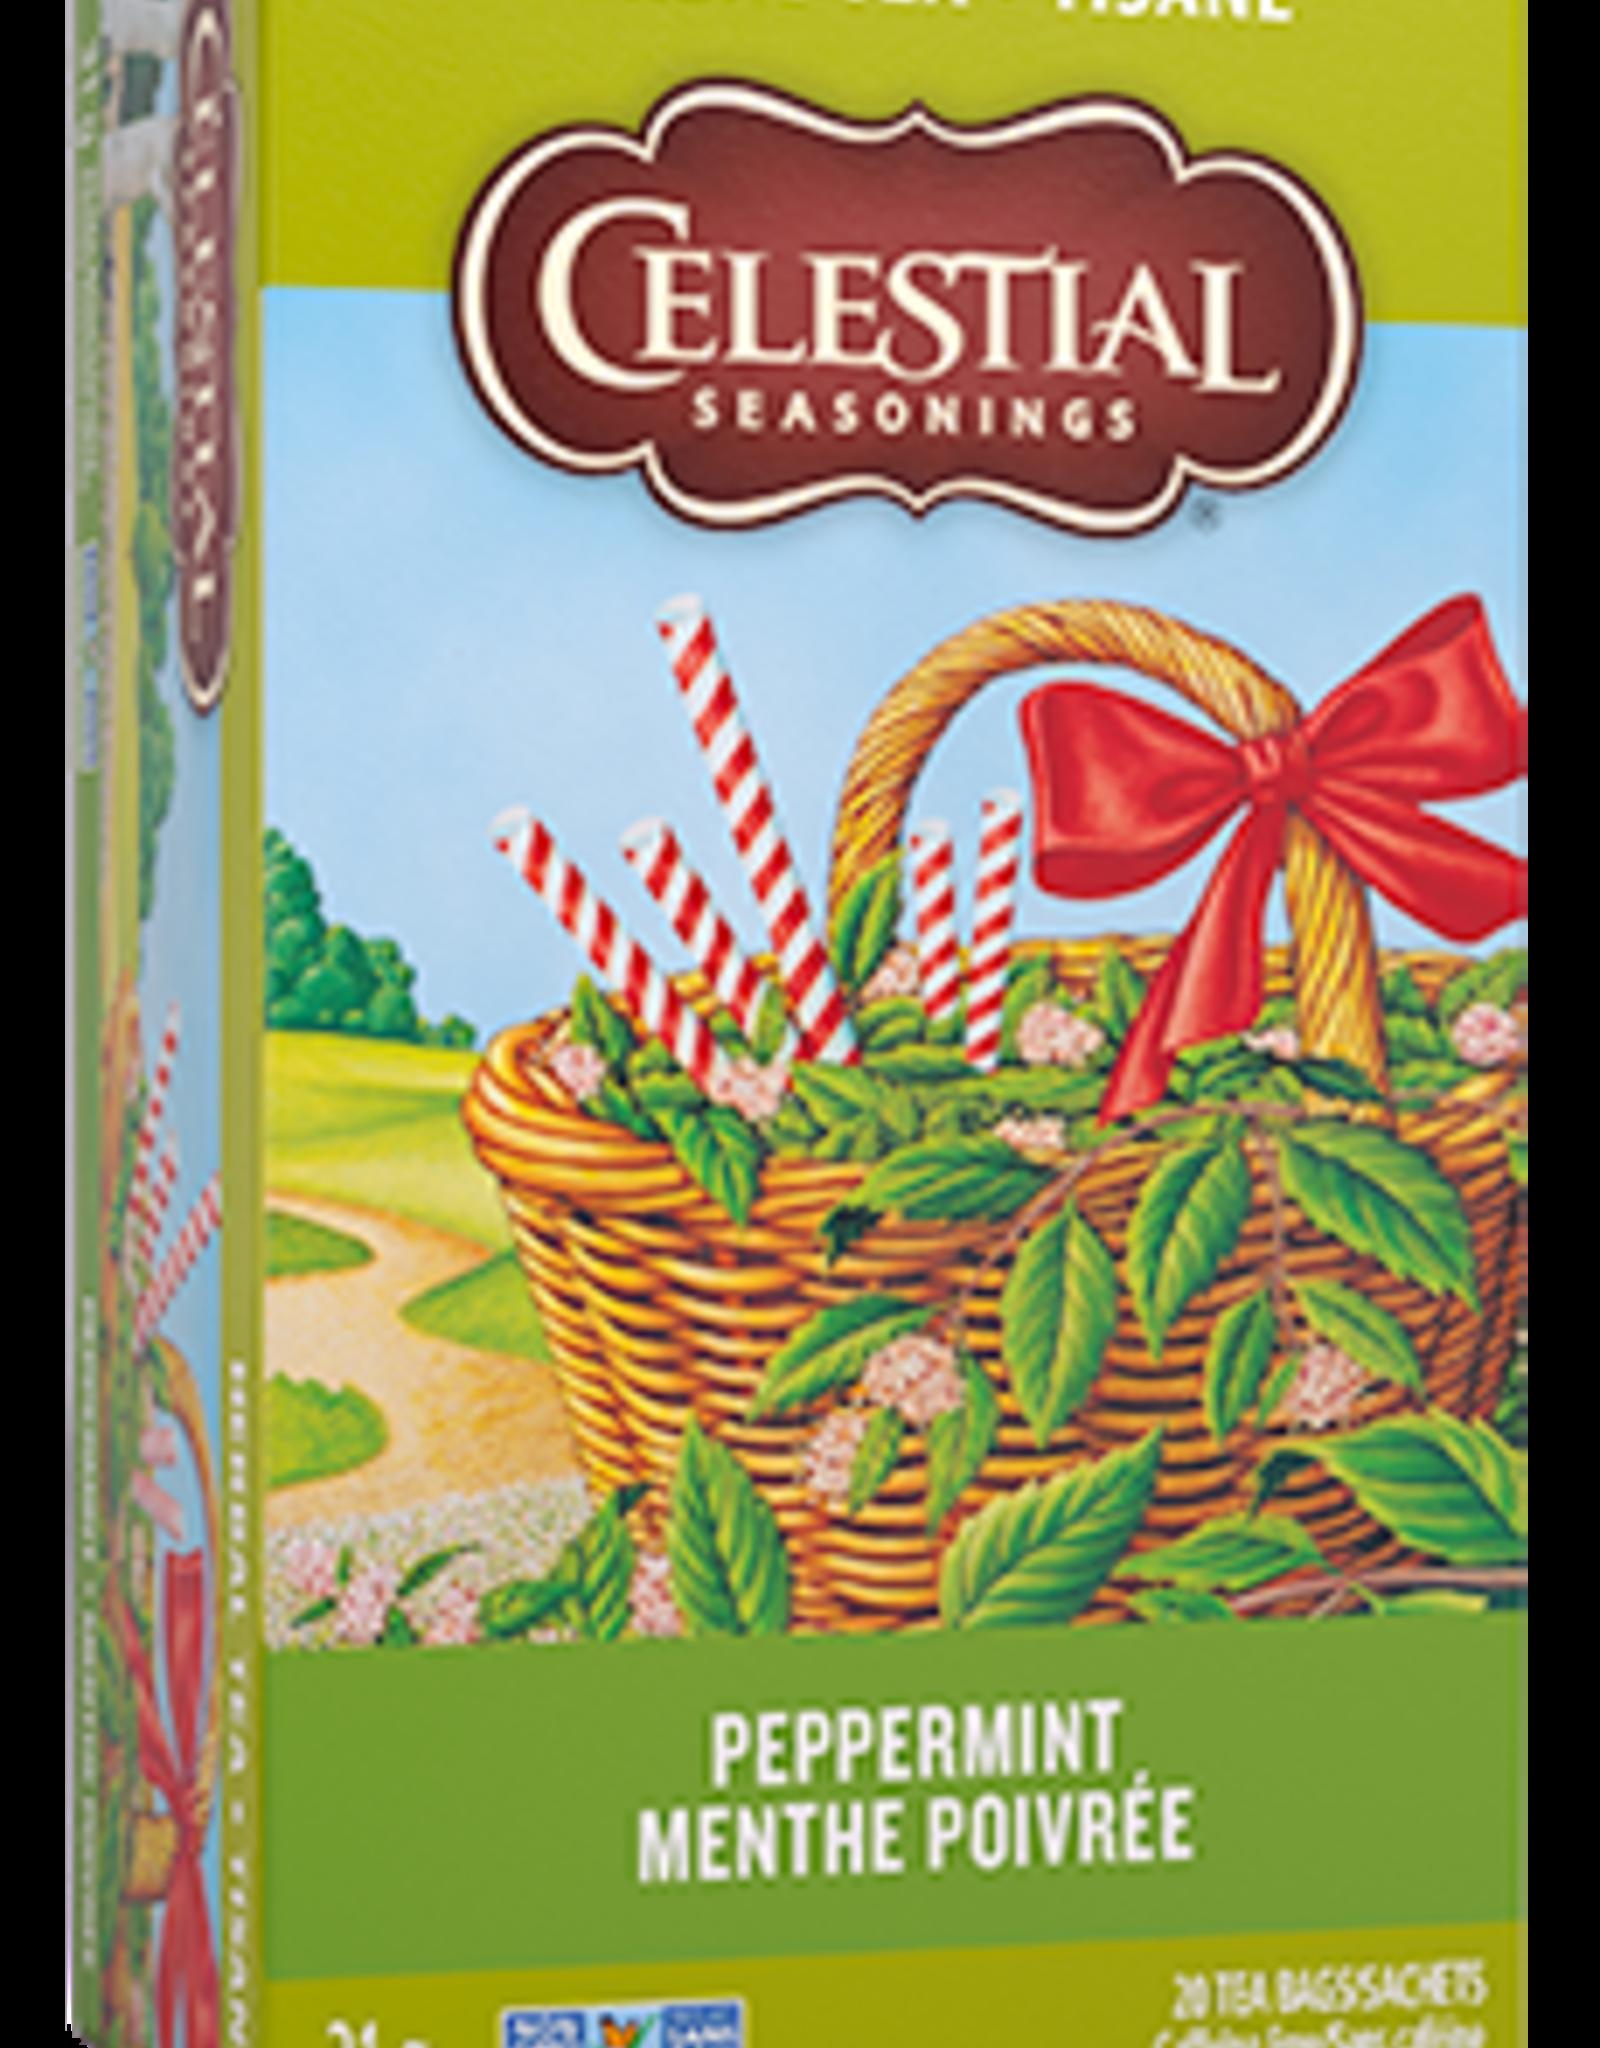 Celestial Seasonings Celestial Seasonings - Tea, Peppermint (31g)